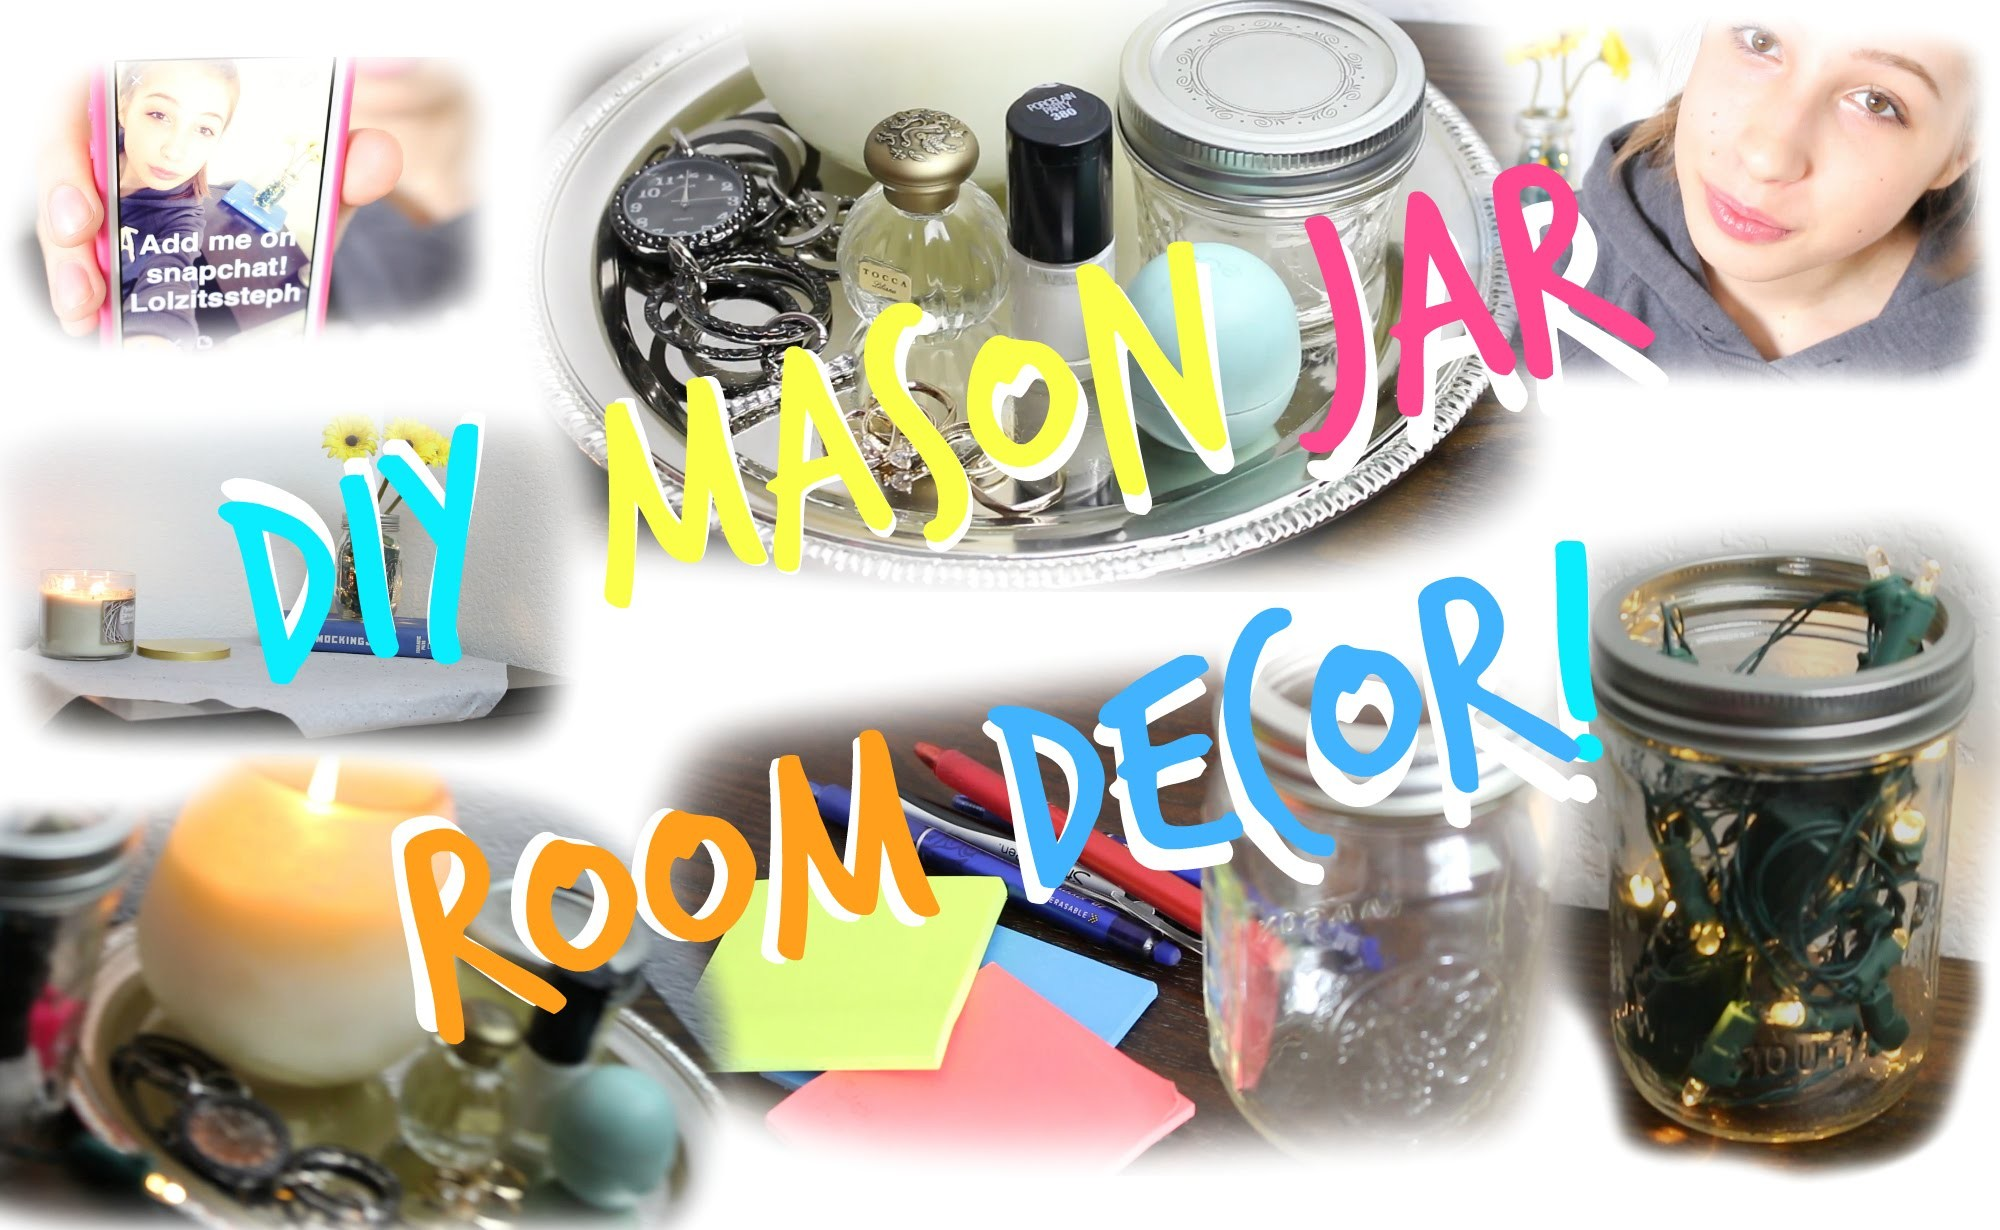 DIY: 7 Cute and Easy Mason Jar Room Decor!